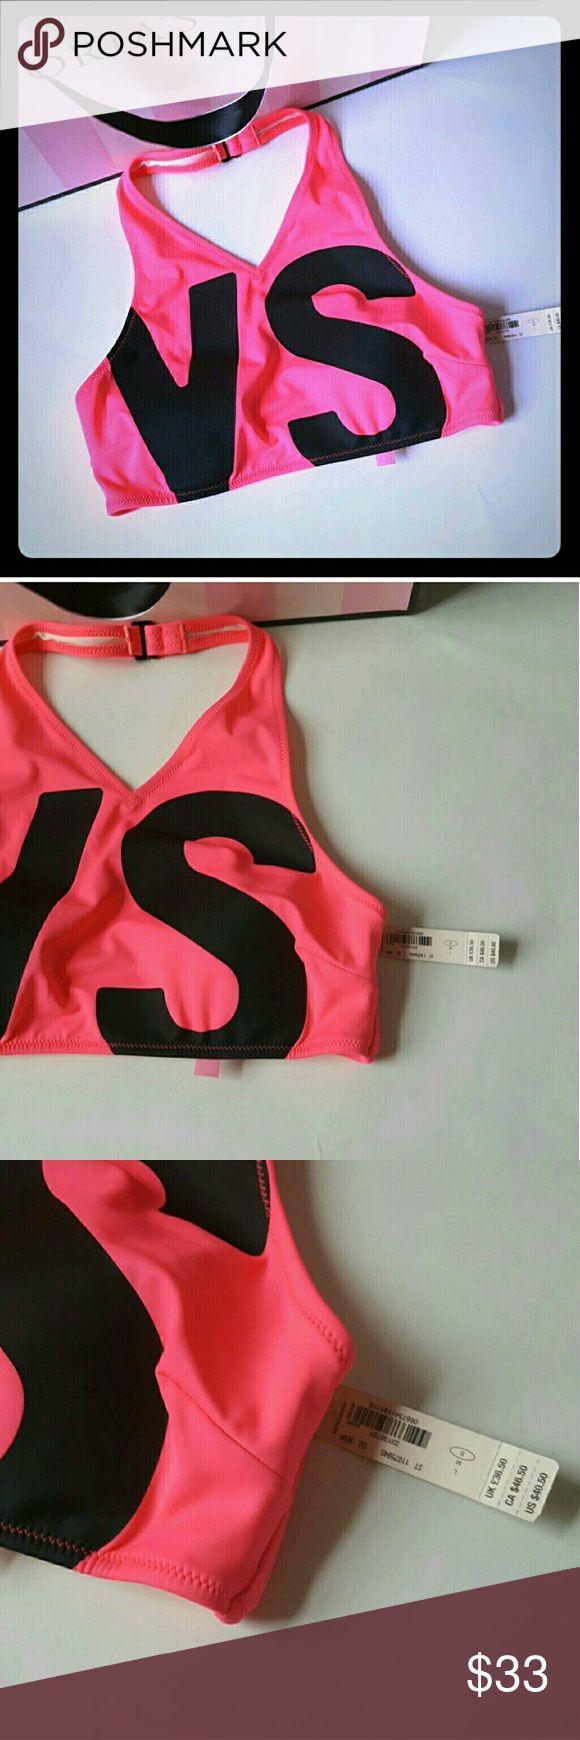 New! Victoria's Secret swim bikini top! New with tags! victoria's Secret swim bikini top, size small. Fits 32c 32d 34a 34b and 34c. Removable light padding.  Bundle up! Offers always welcome:) Victoria's Secret Swim Bikinis